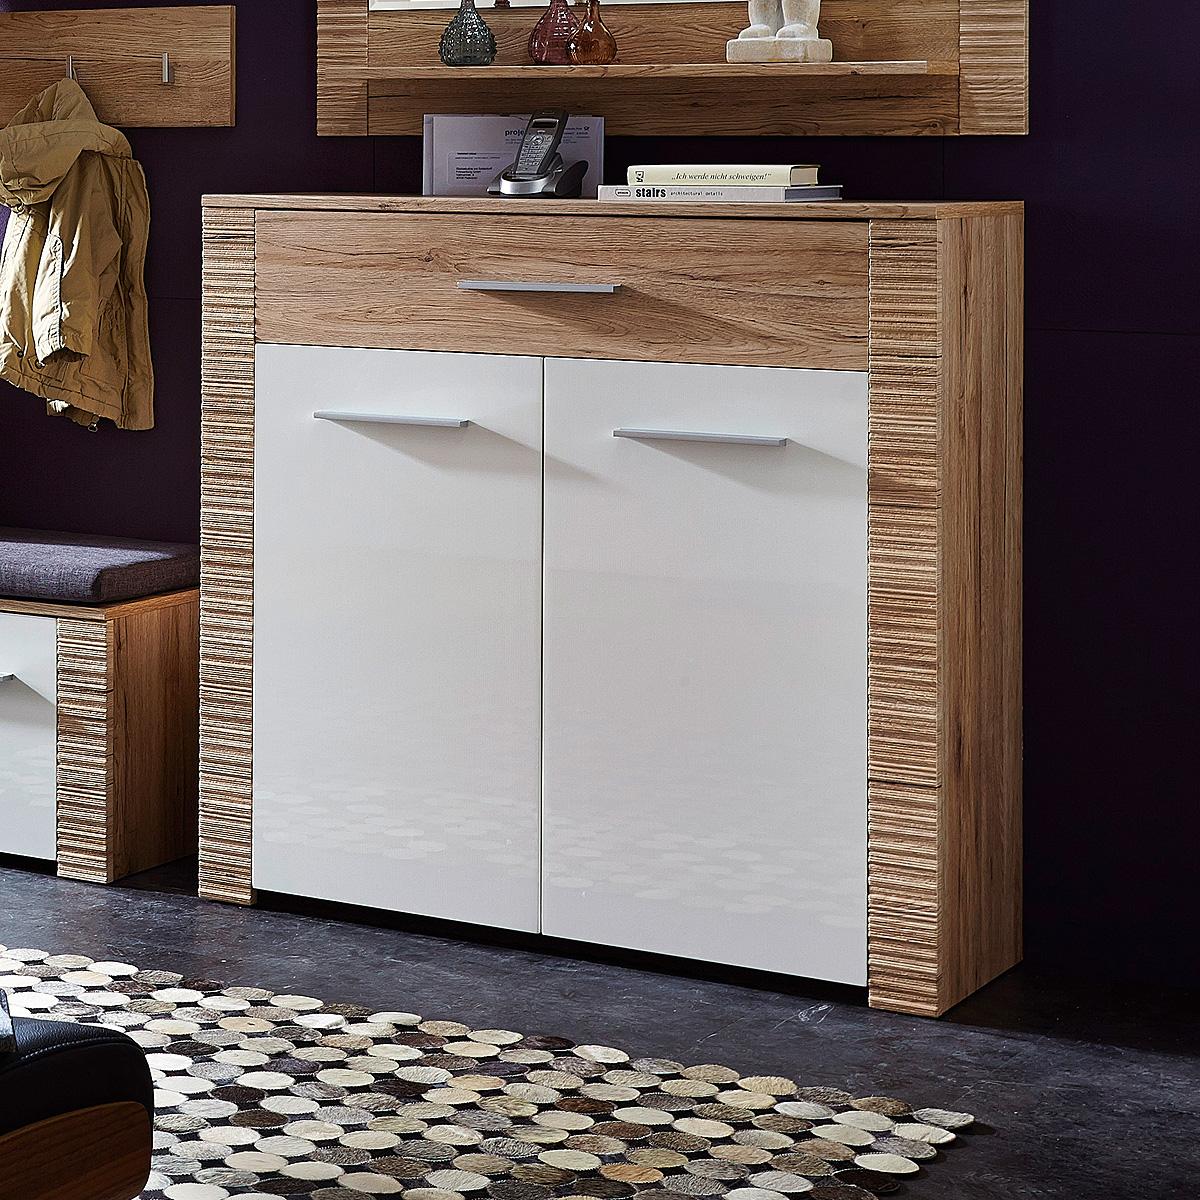 schuhschrank contest x garderobe kommode wei hochglanz. Black Bedroom Furniture Sets. Home Design Ideas